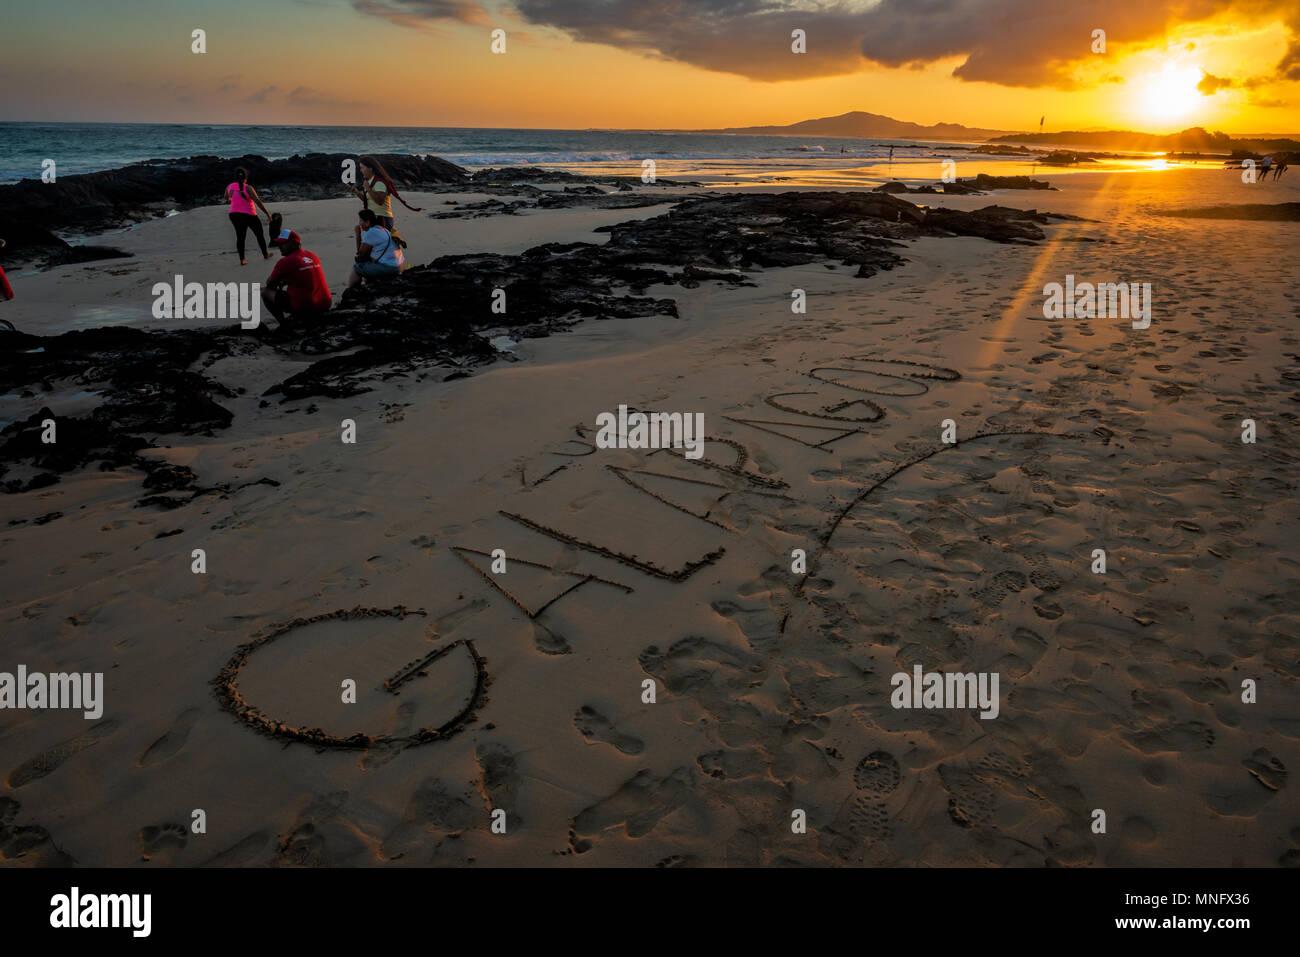 '2018 Galapagos' written in the sand of the beach at Puerto Villamil, Isabela Island, Galapagos Islands, Ecuador. - Stock Image